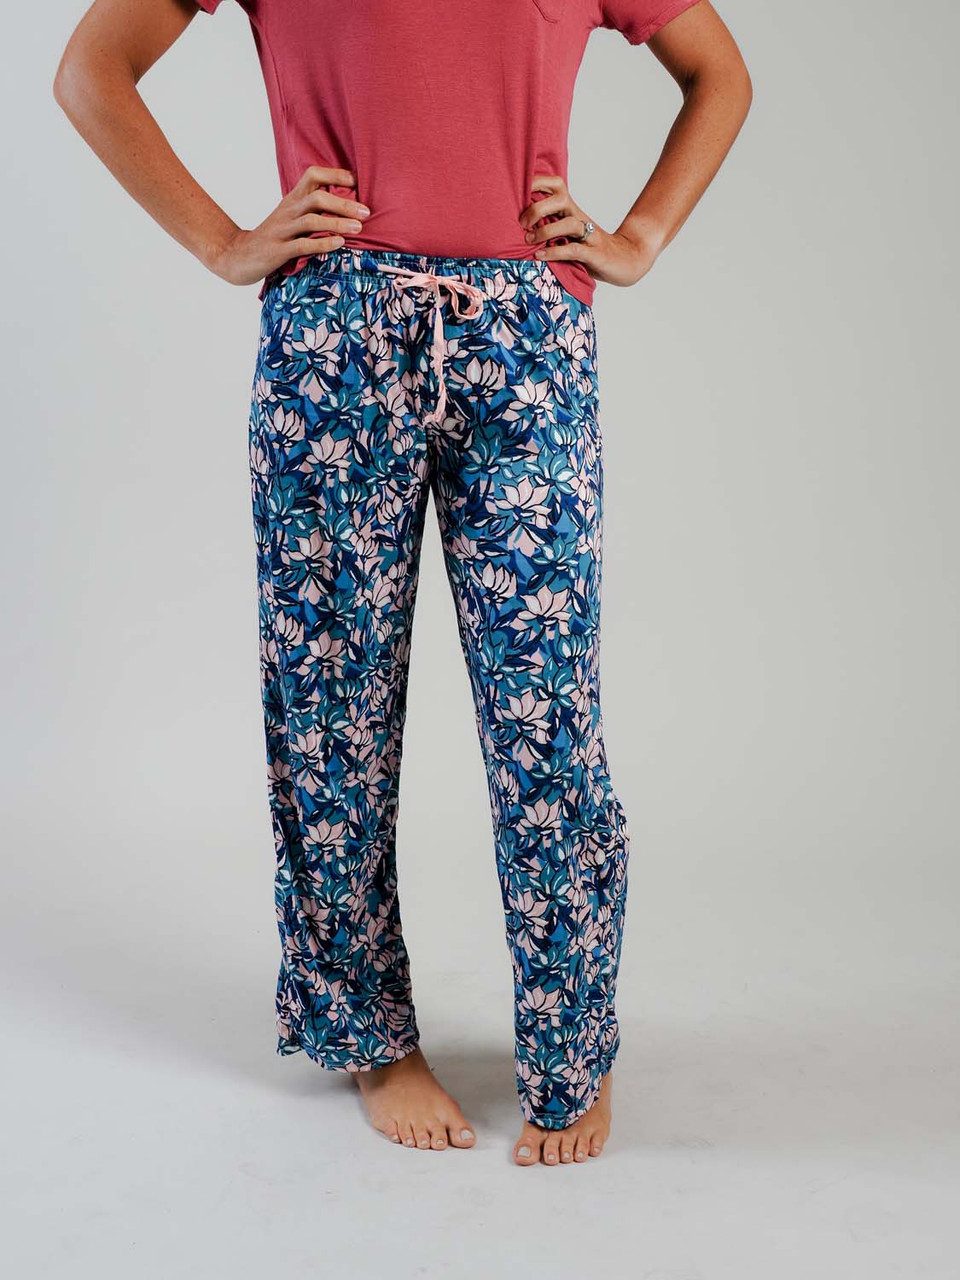 pink green blue floral lounge pant pajama pants